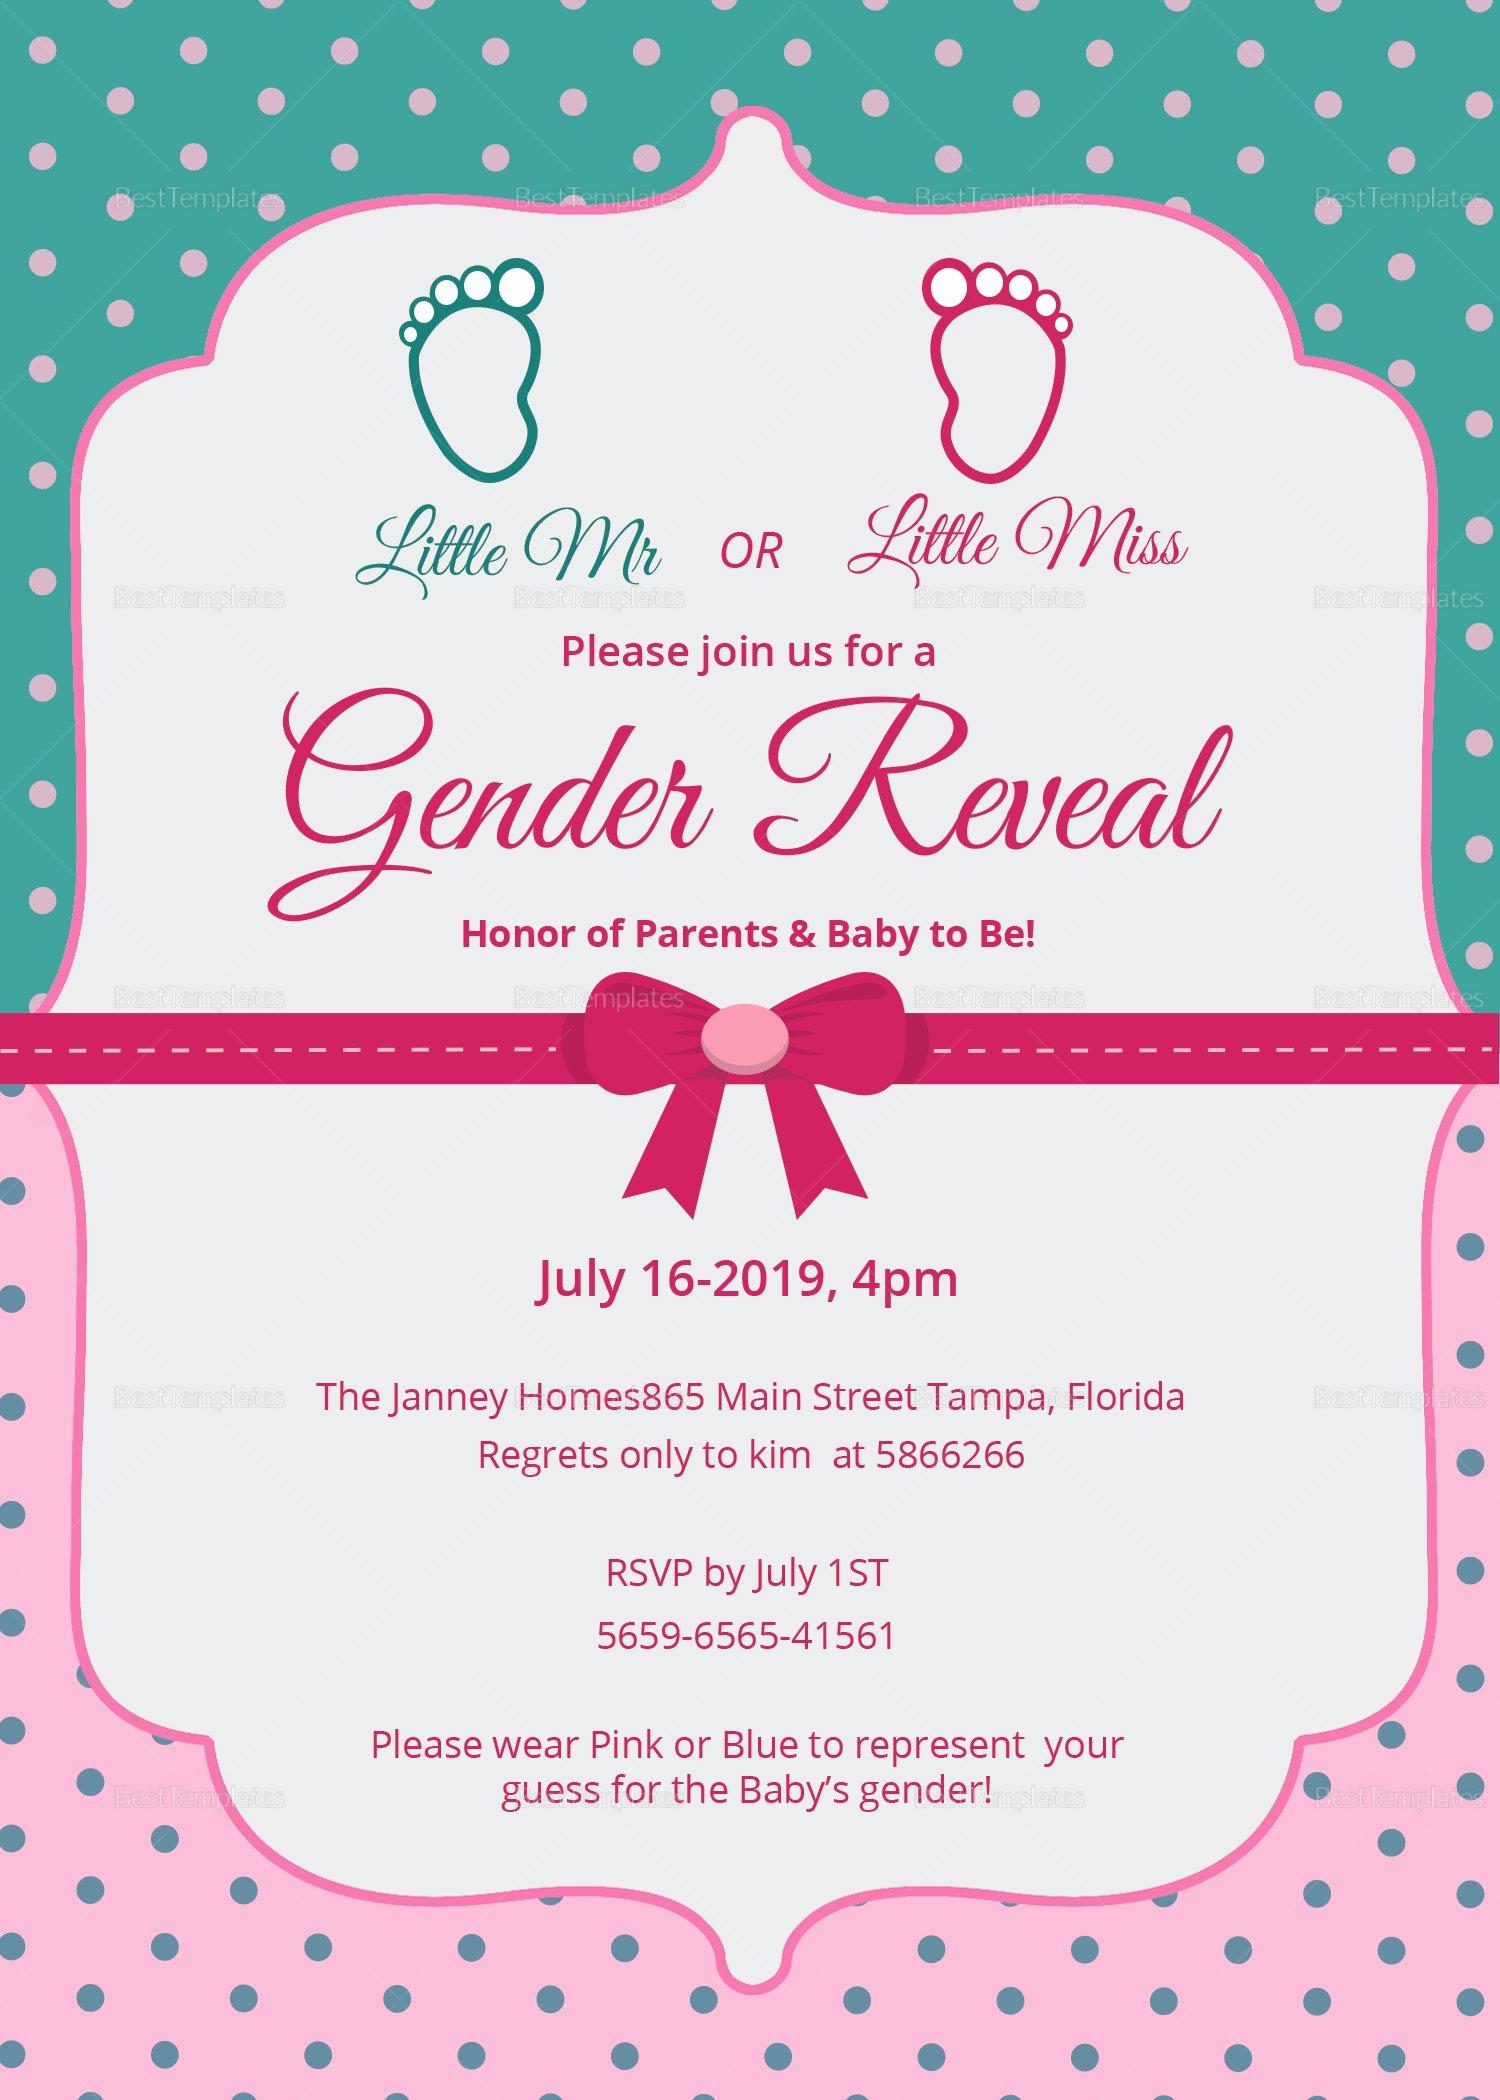 Gender Reveal Invitation Templates New Elegant Gender Reveal Invitation Card Design Template In